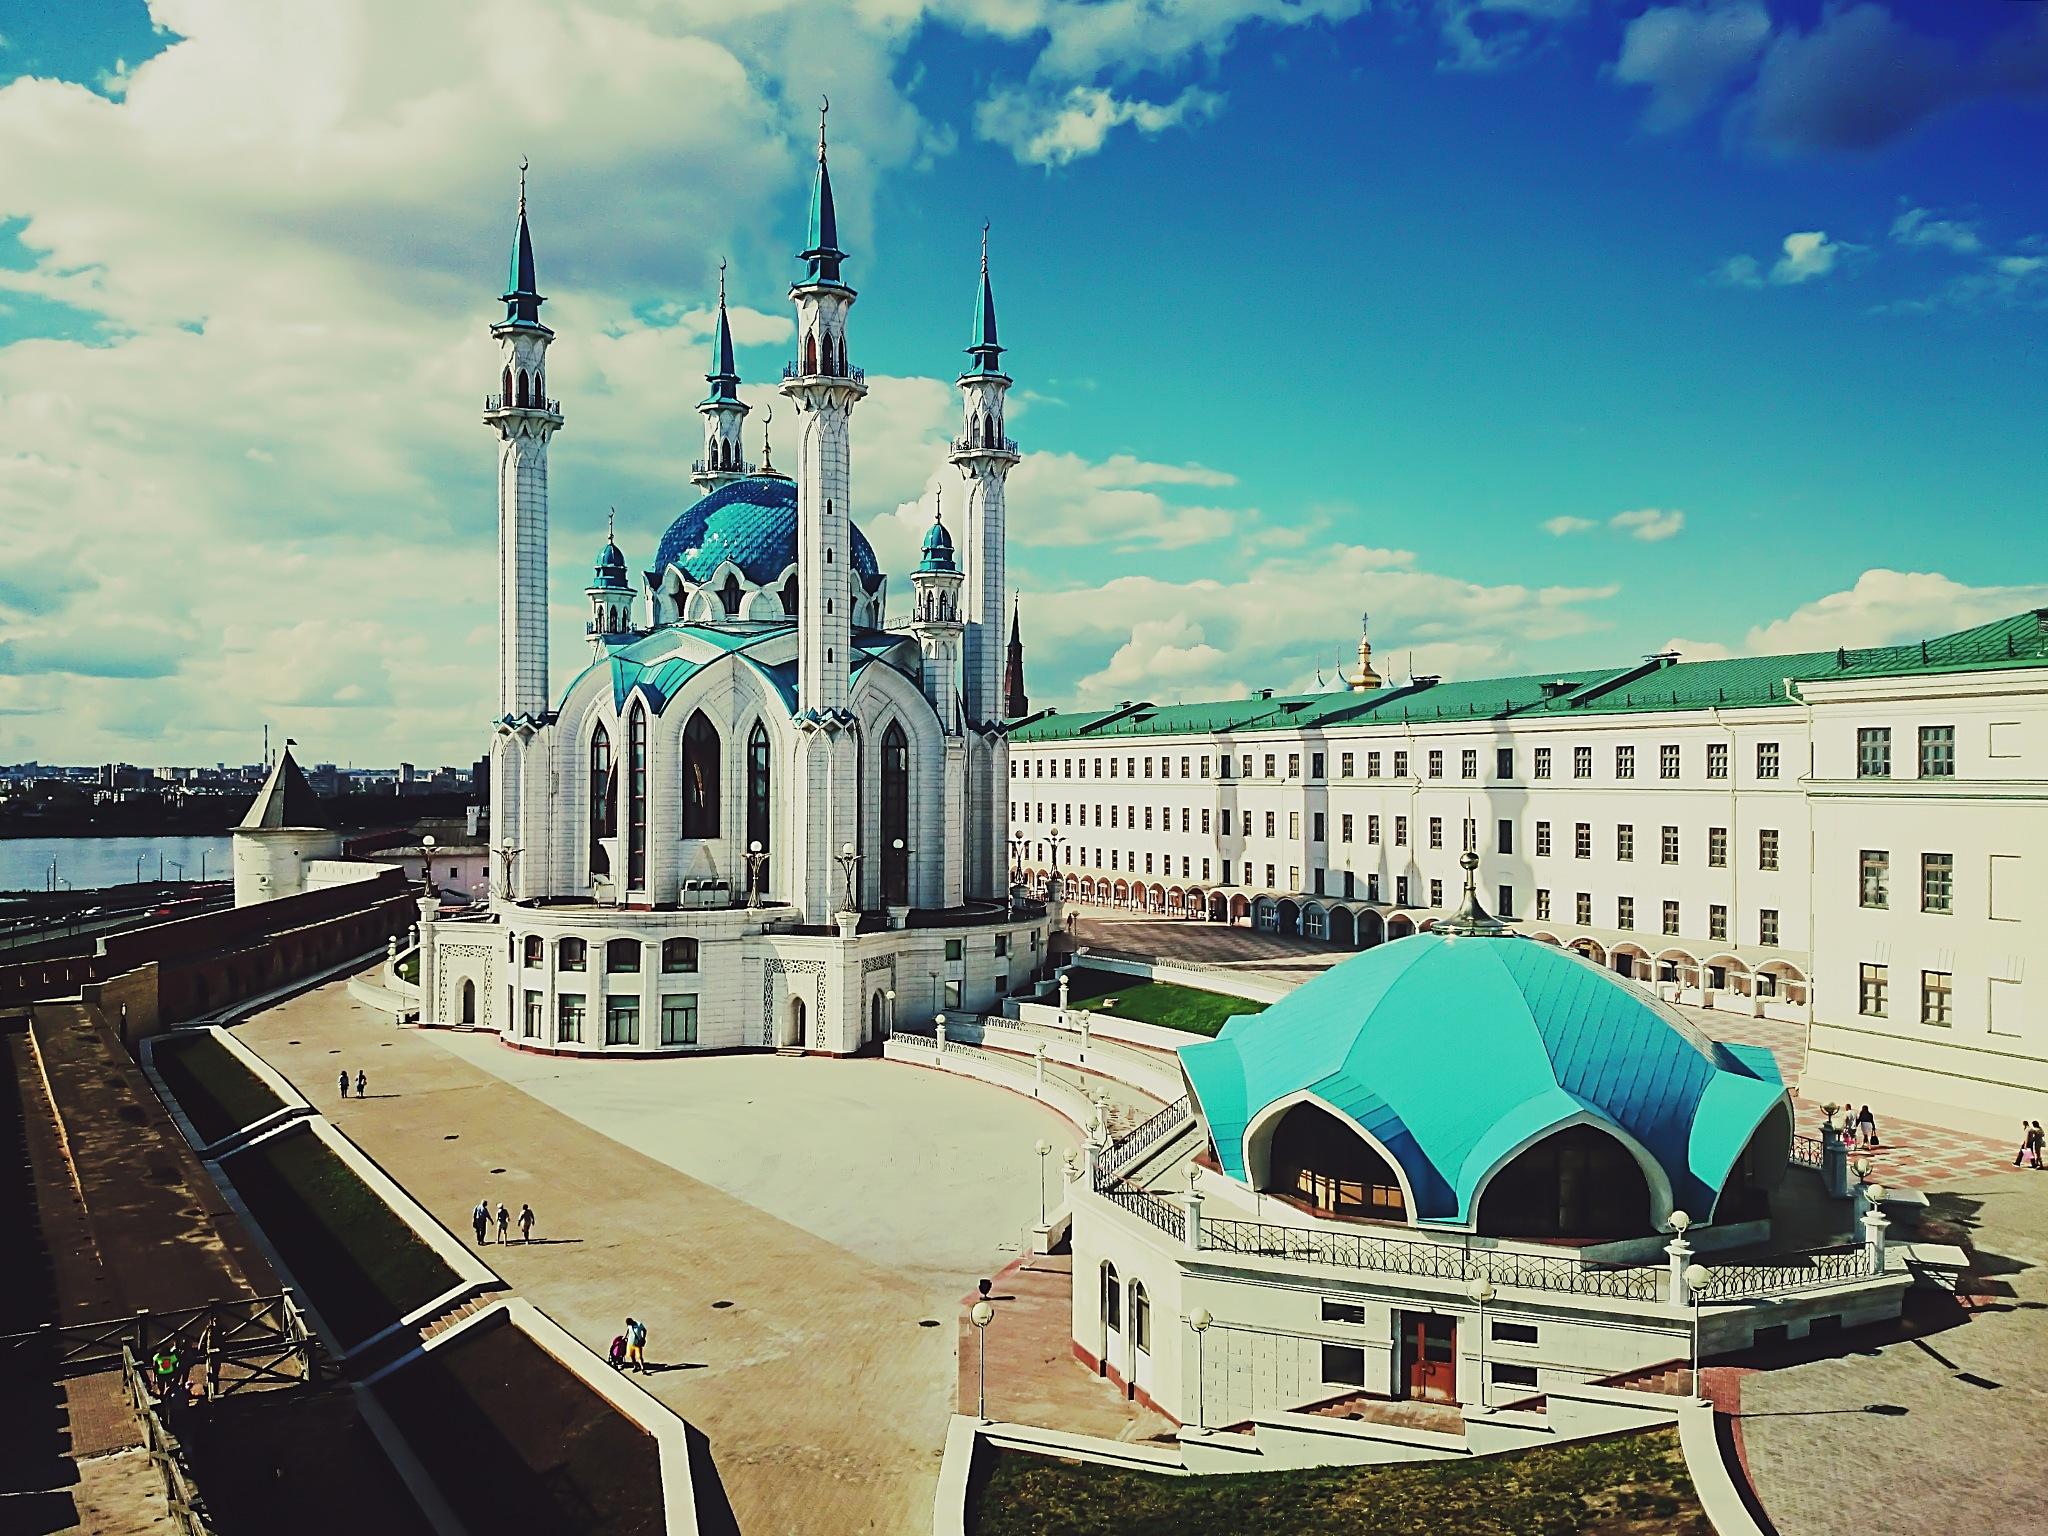 The Qolşärif Mosque by Daria Klepikova